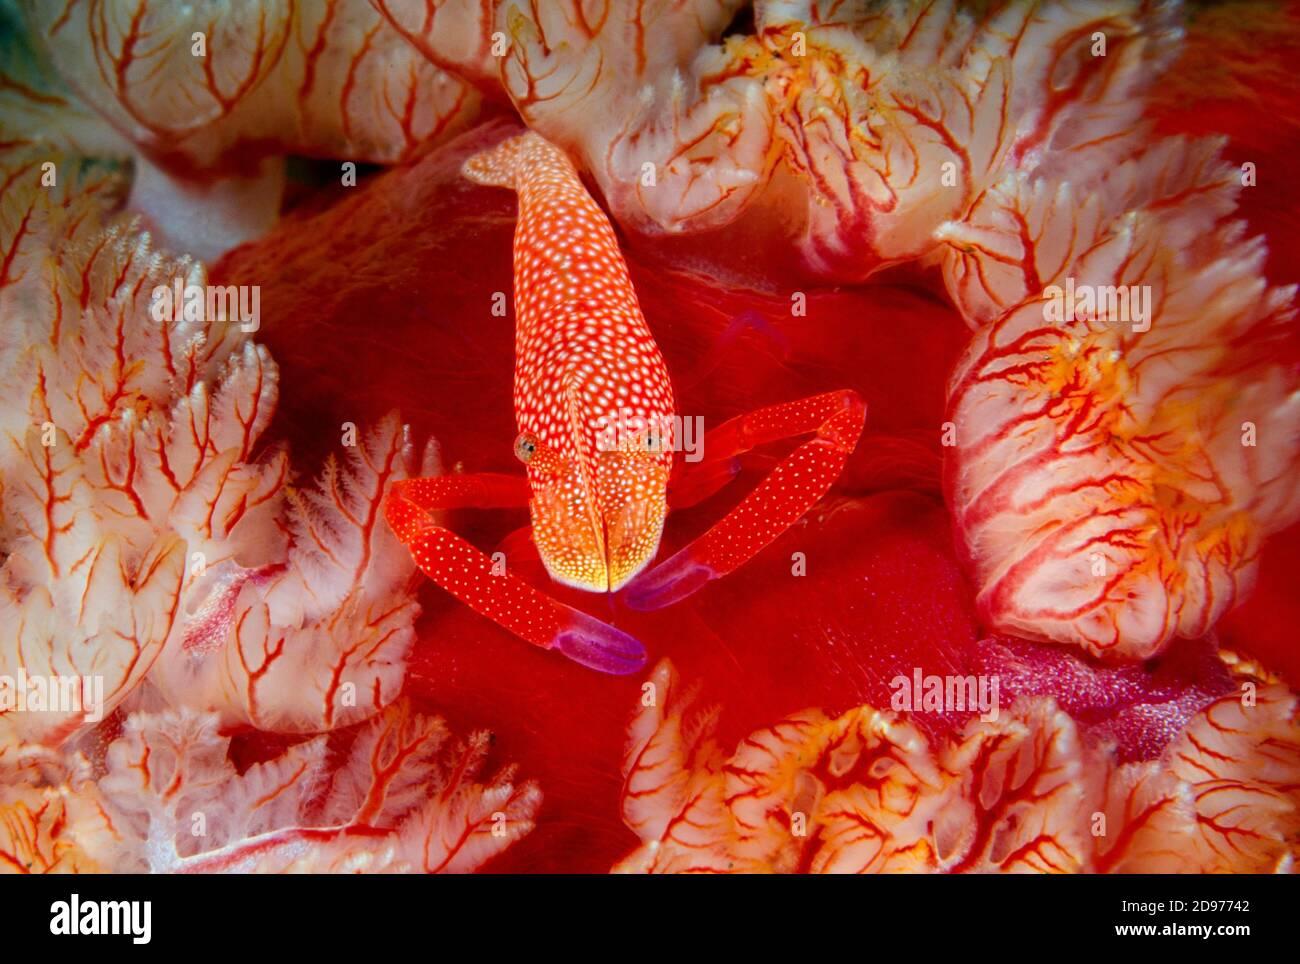 Emperor Shrimp, Periclimenes imperator,riding on an Spanish Dancer Nudibranch, Hexabranchus sanguineus. Tulamben, Bali, Indonesia. Pacific Ocean. Stock Photo